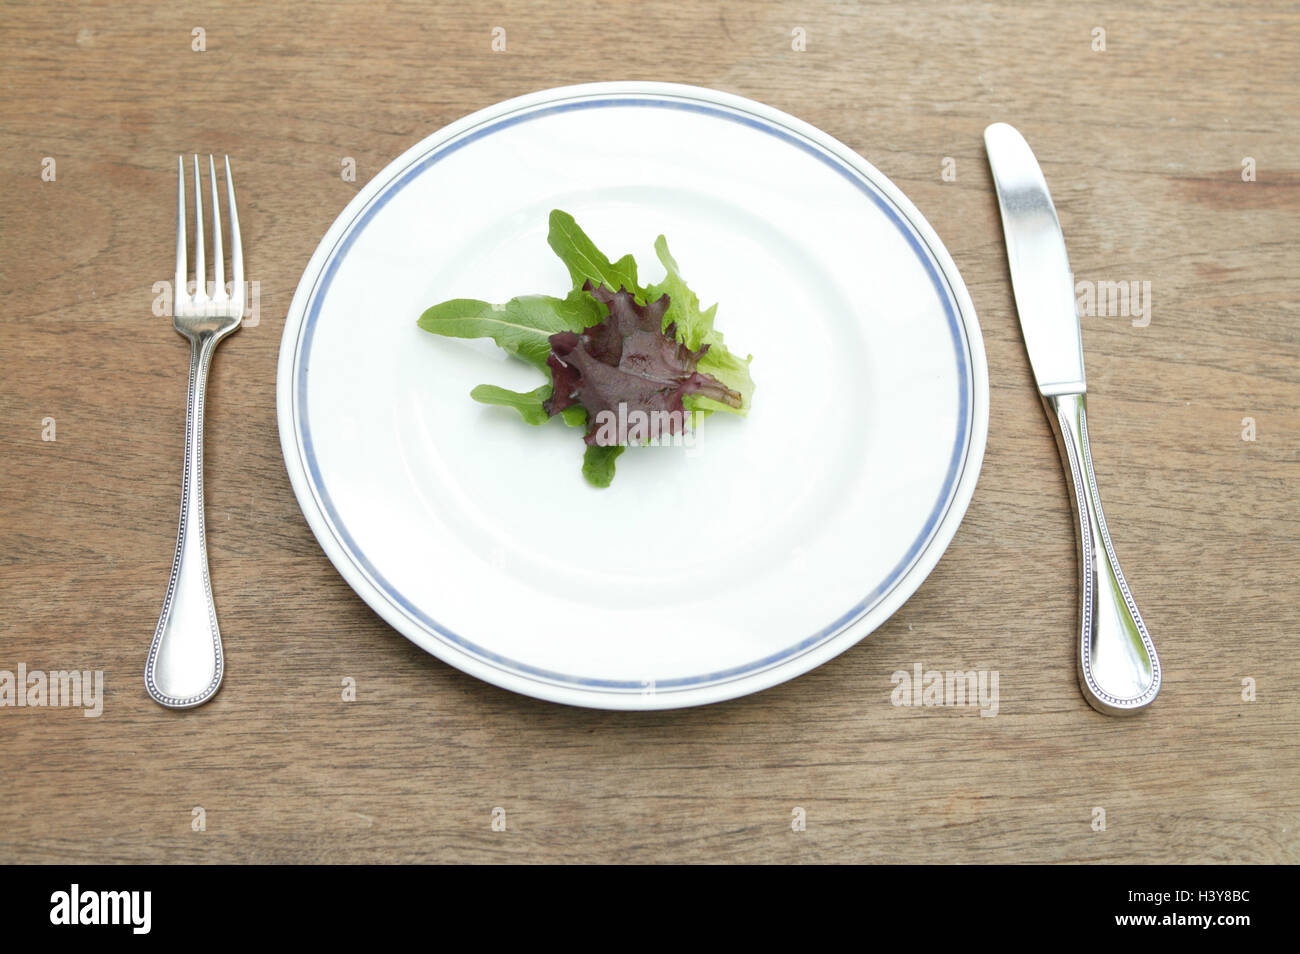 plaque, feuilles de salades, des instruments, des matières de la